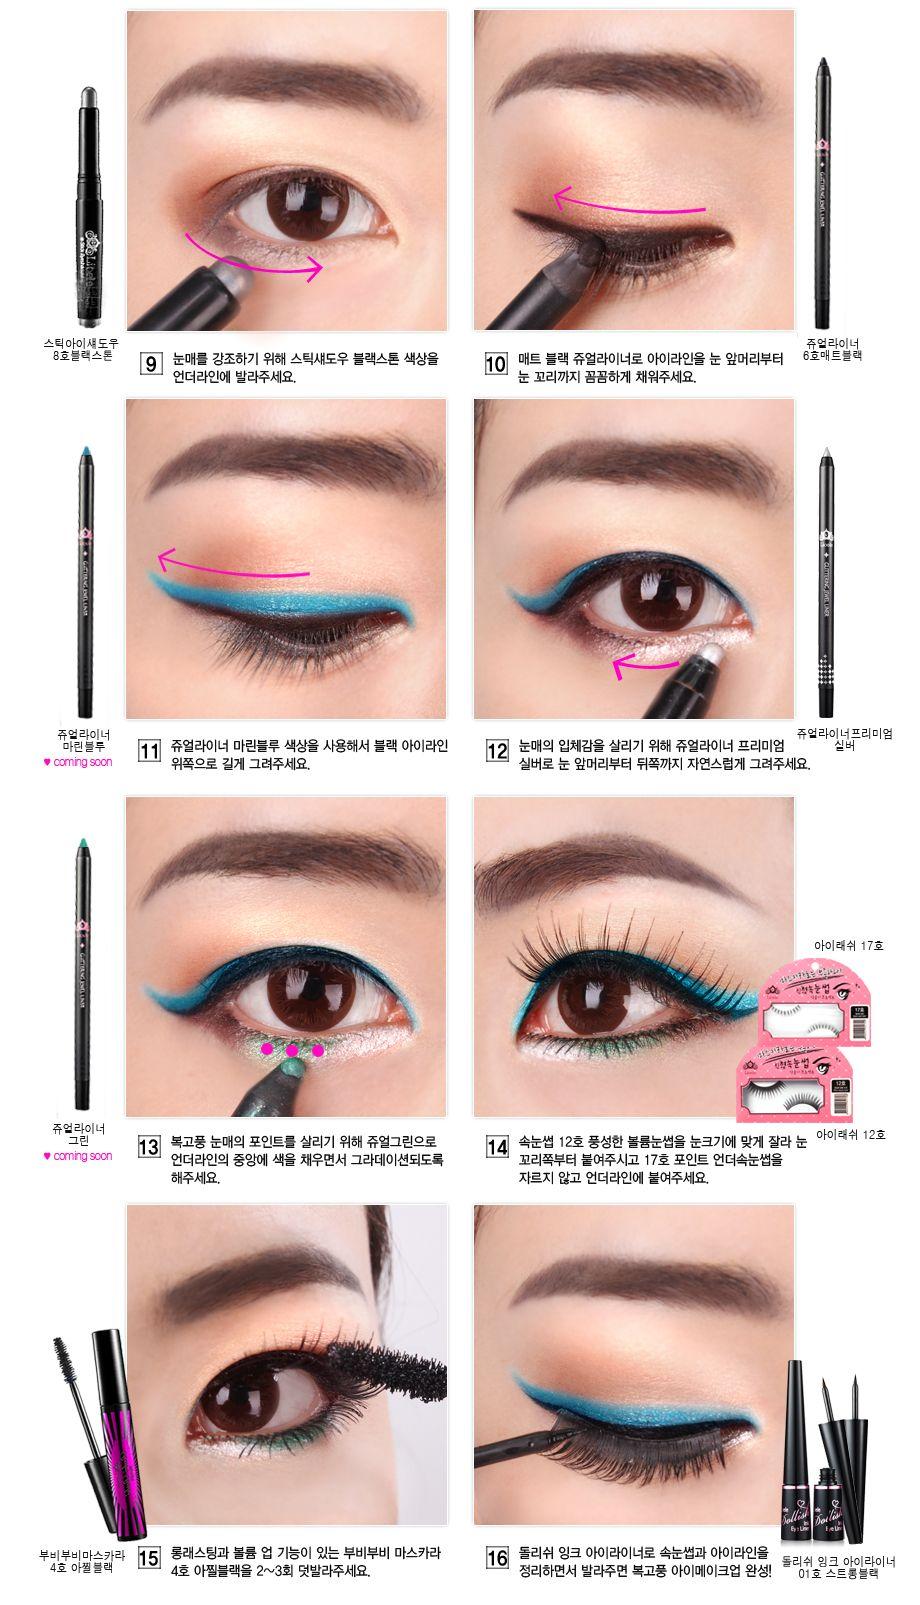 Lioele Punky Retro Makeup Tutorial | ~The Cutest Makeup~ 3